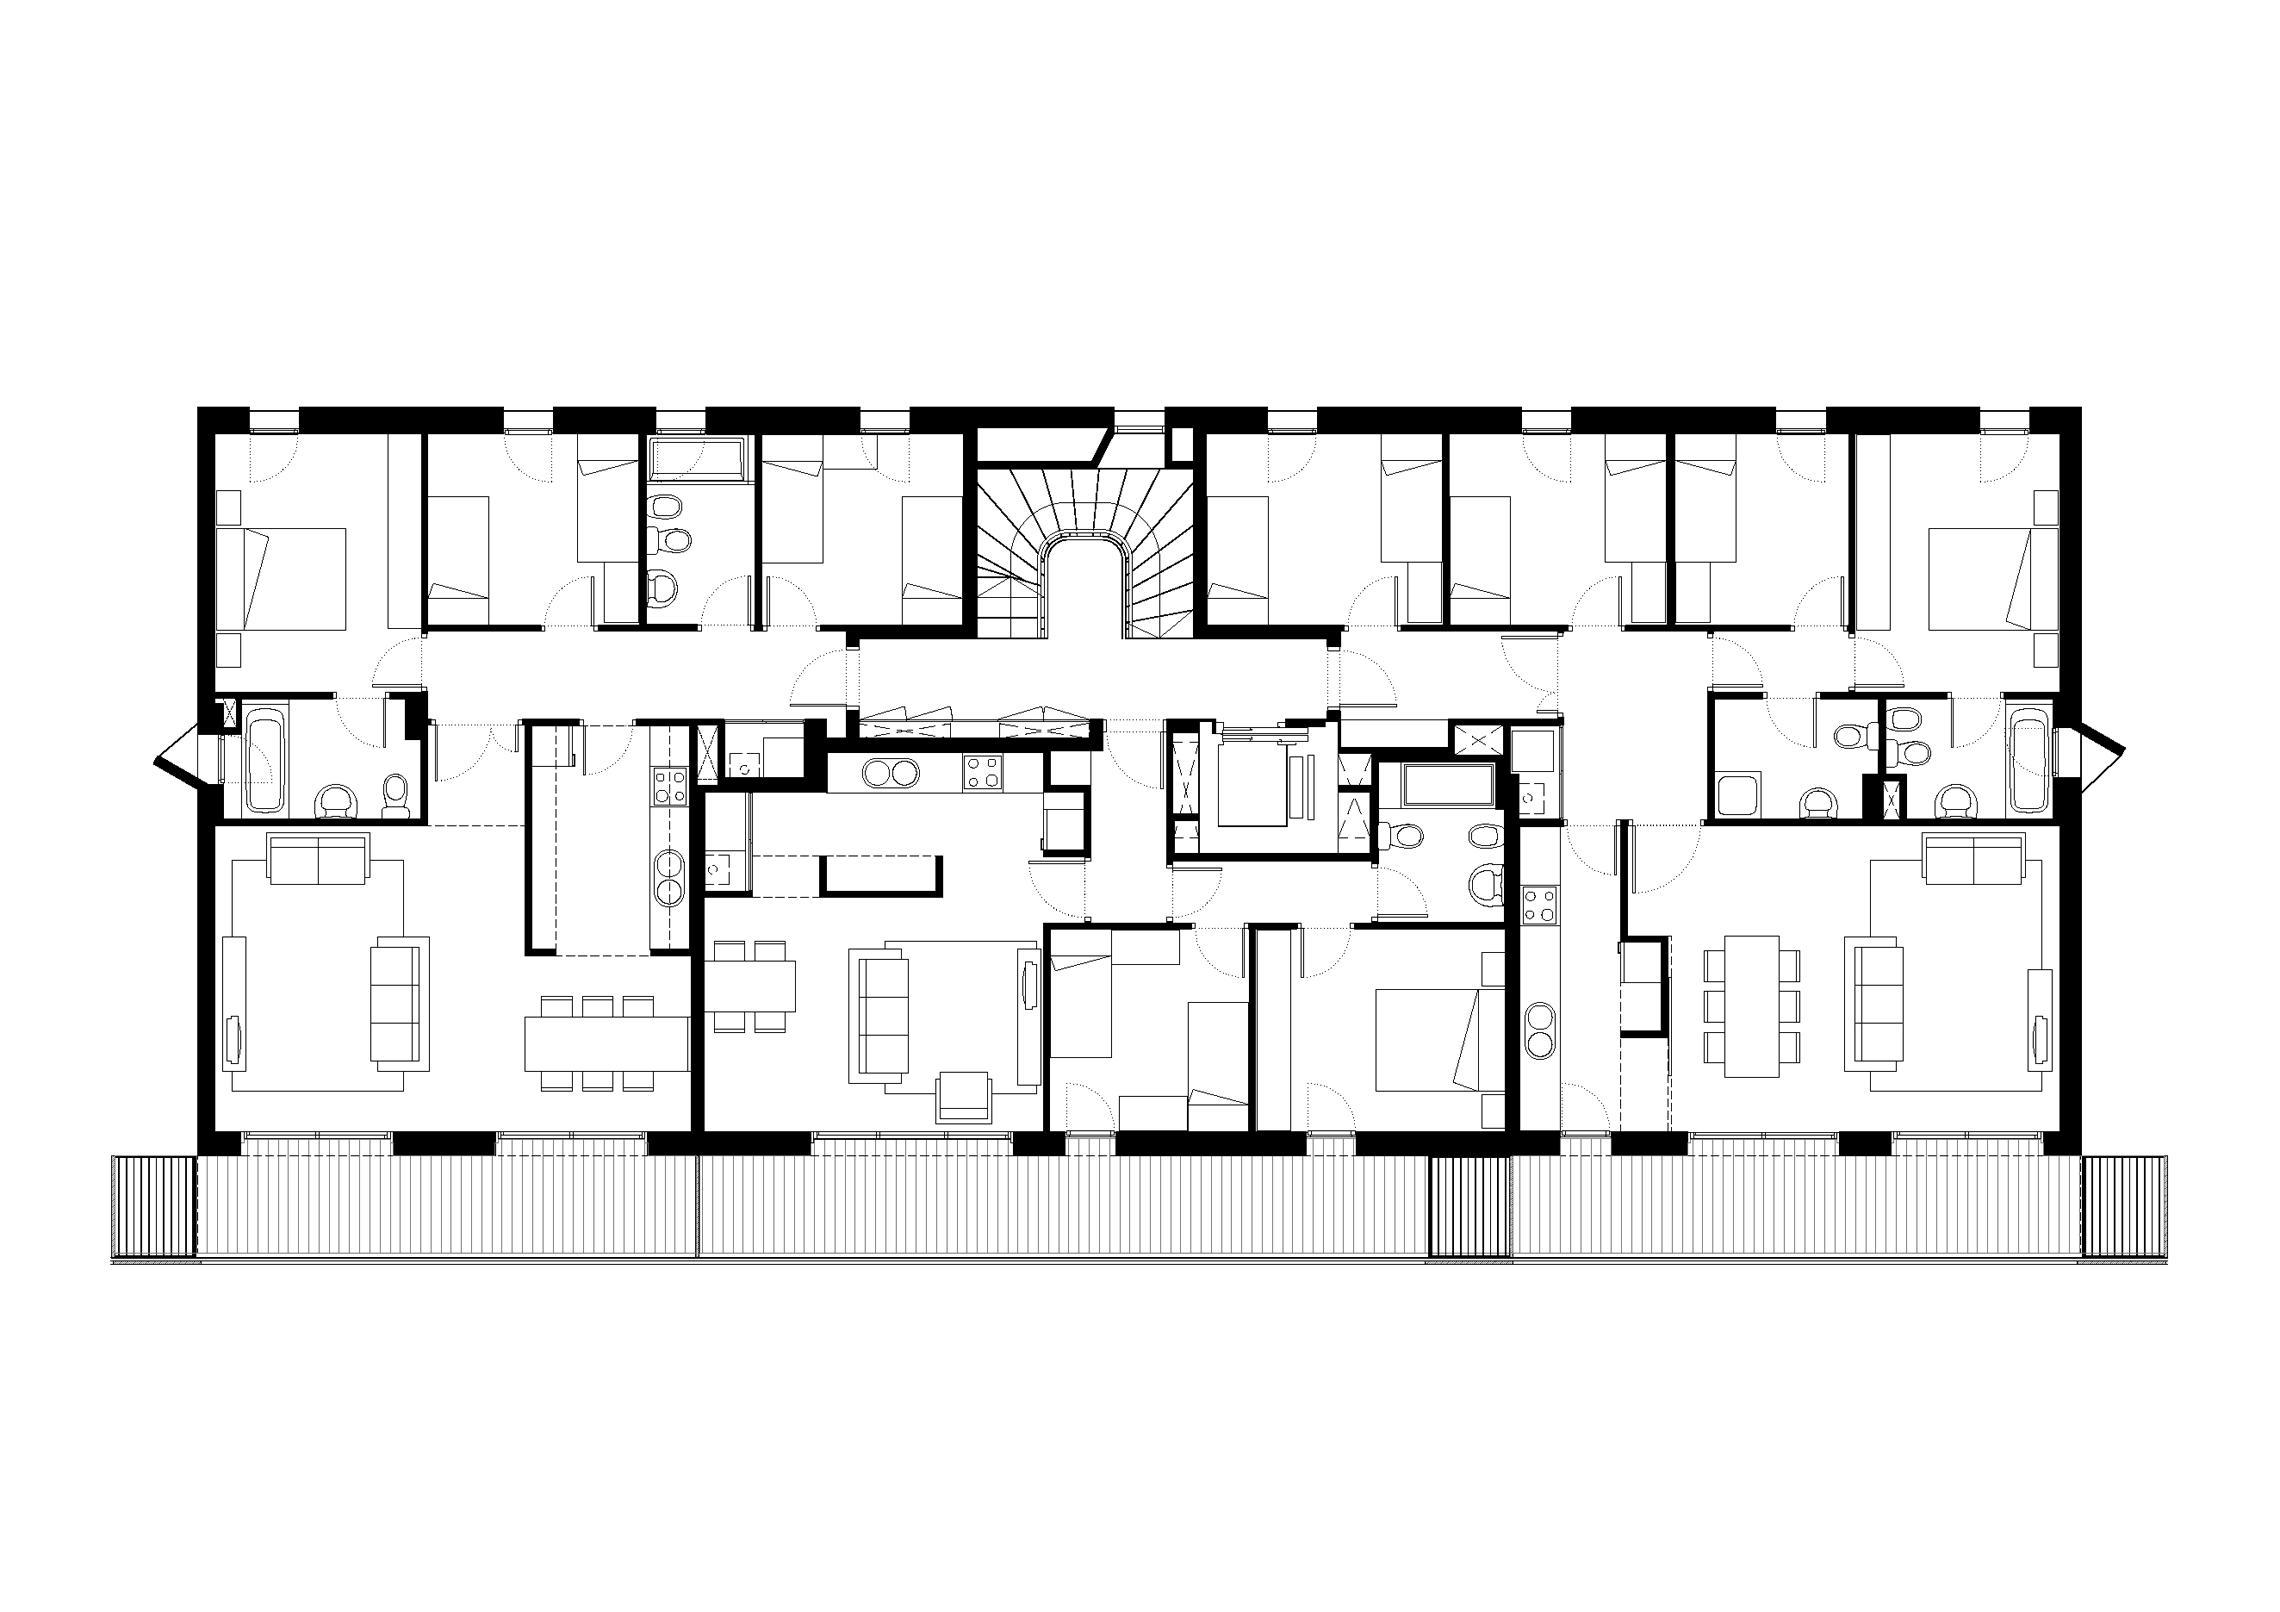 11 2012 às 2280 × 1612 em Conjunto Habitacional – Barcelona #666666 2280 1612